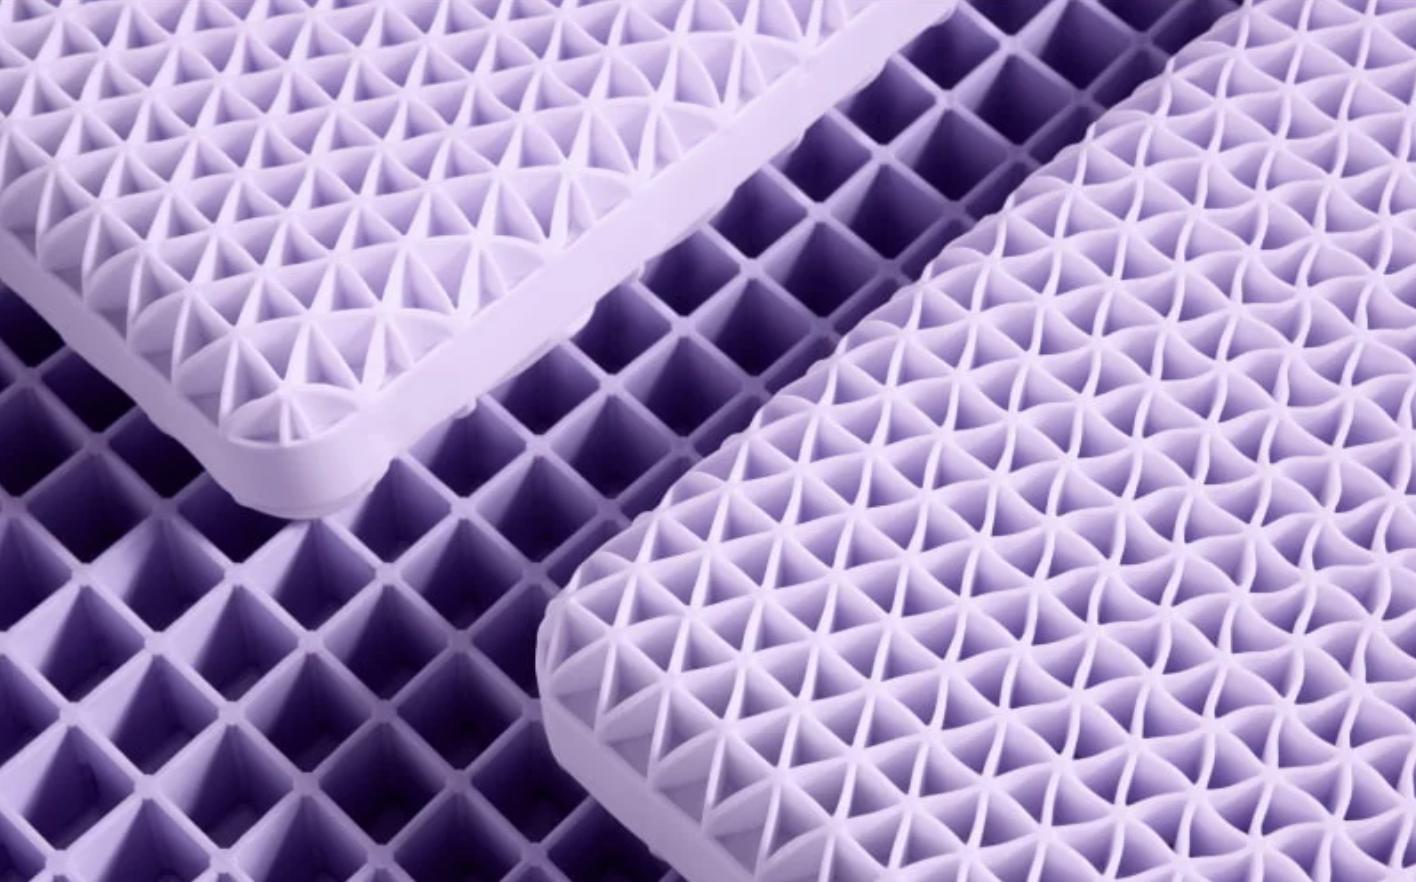 purple grid pillow comfort low profile